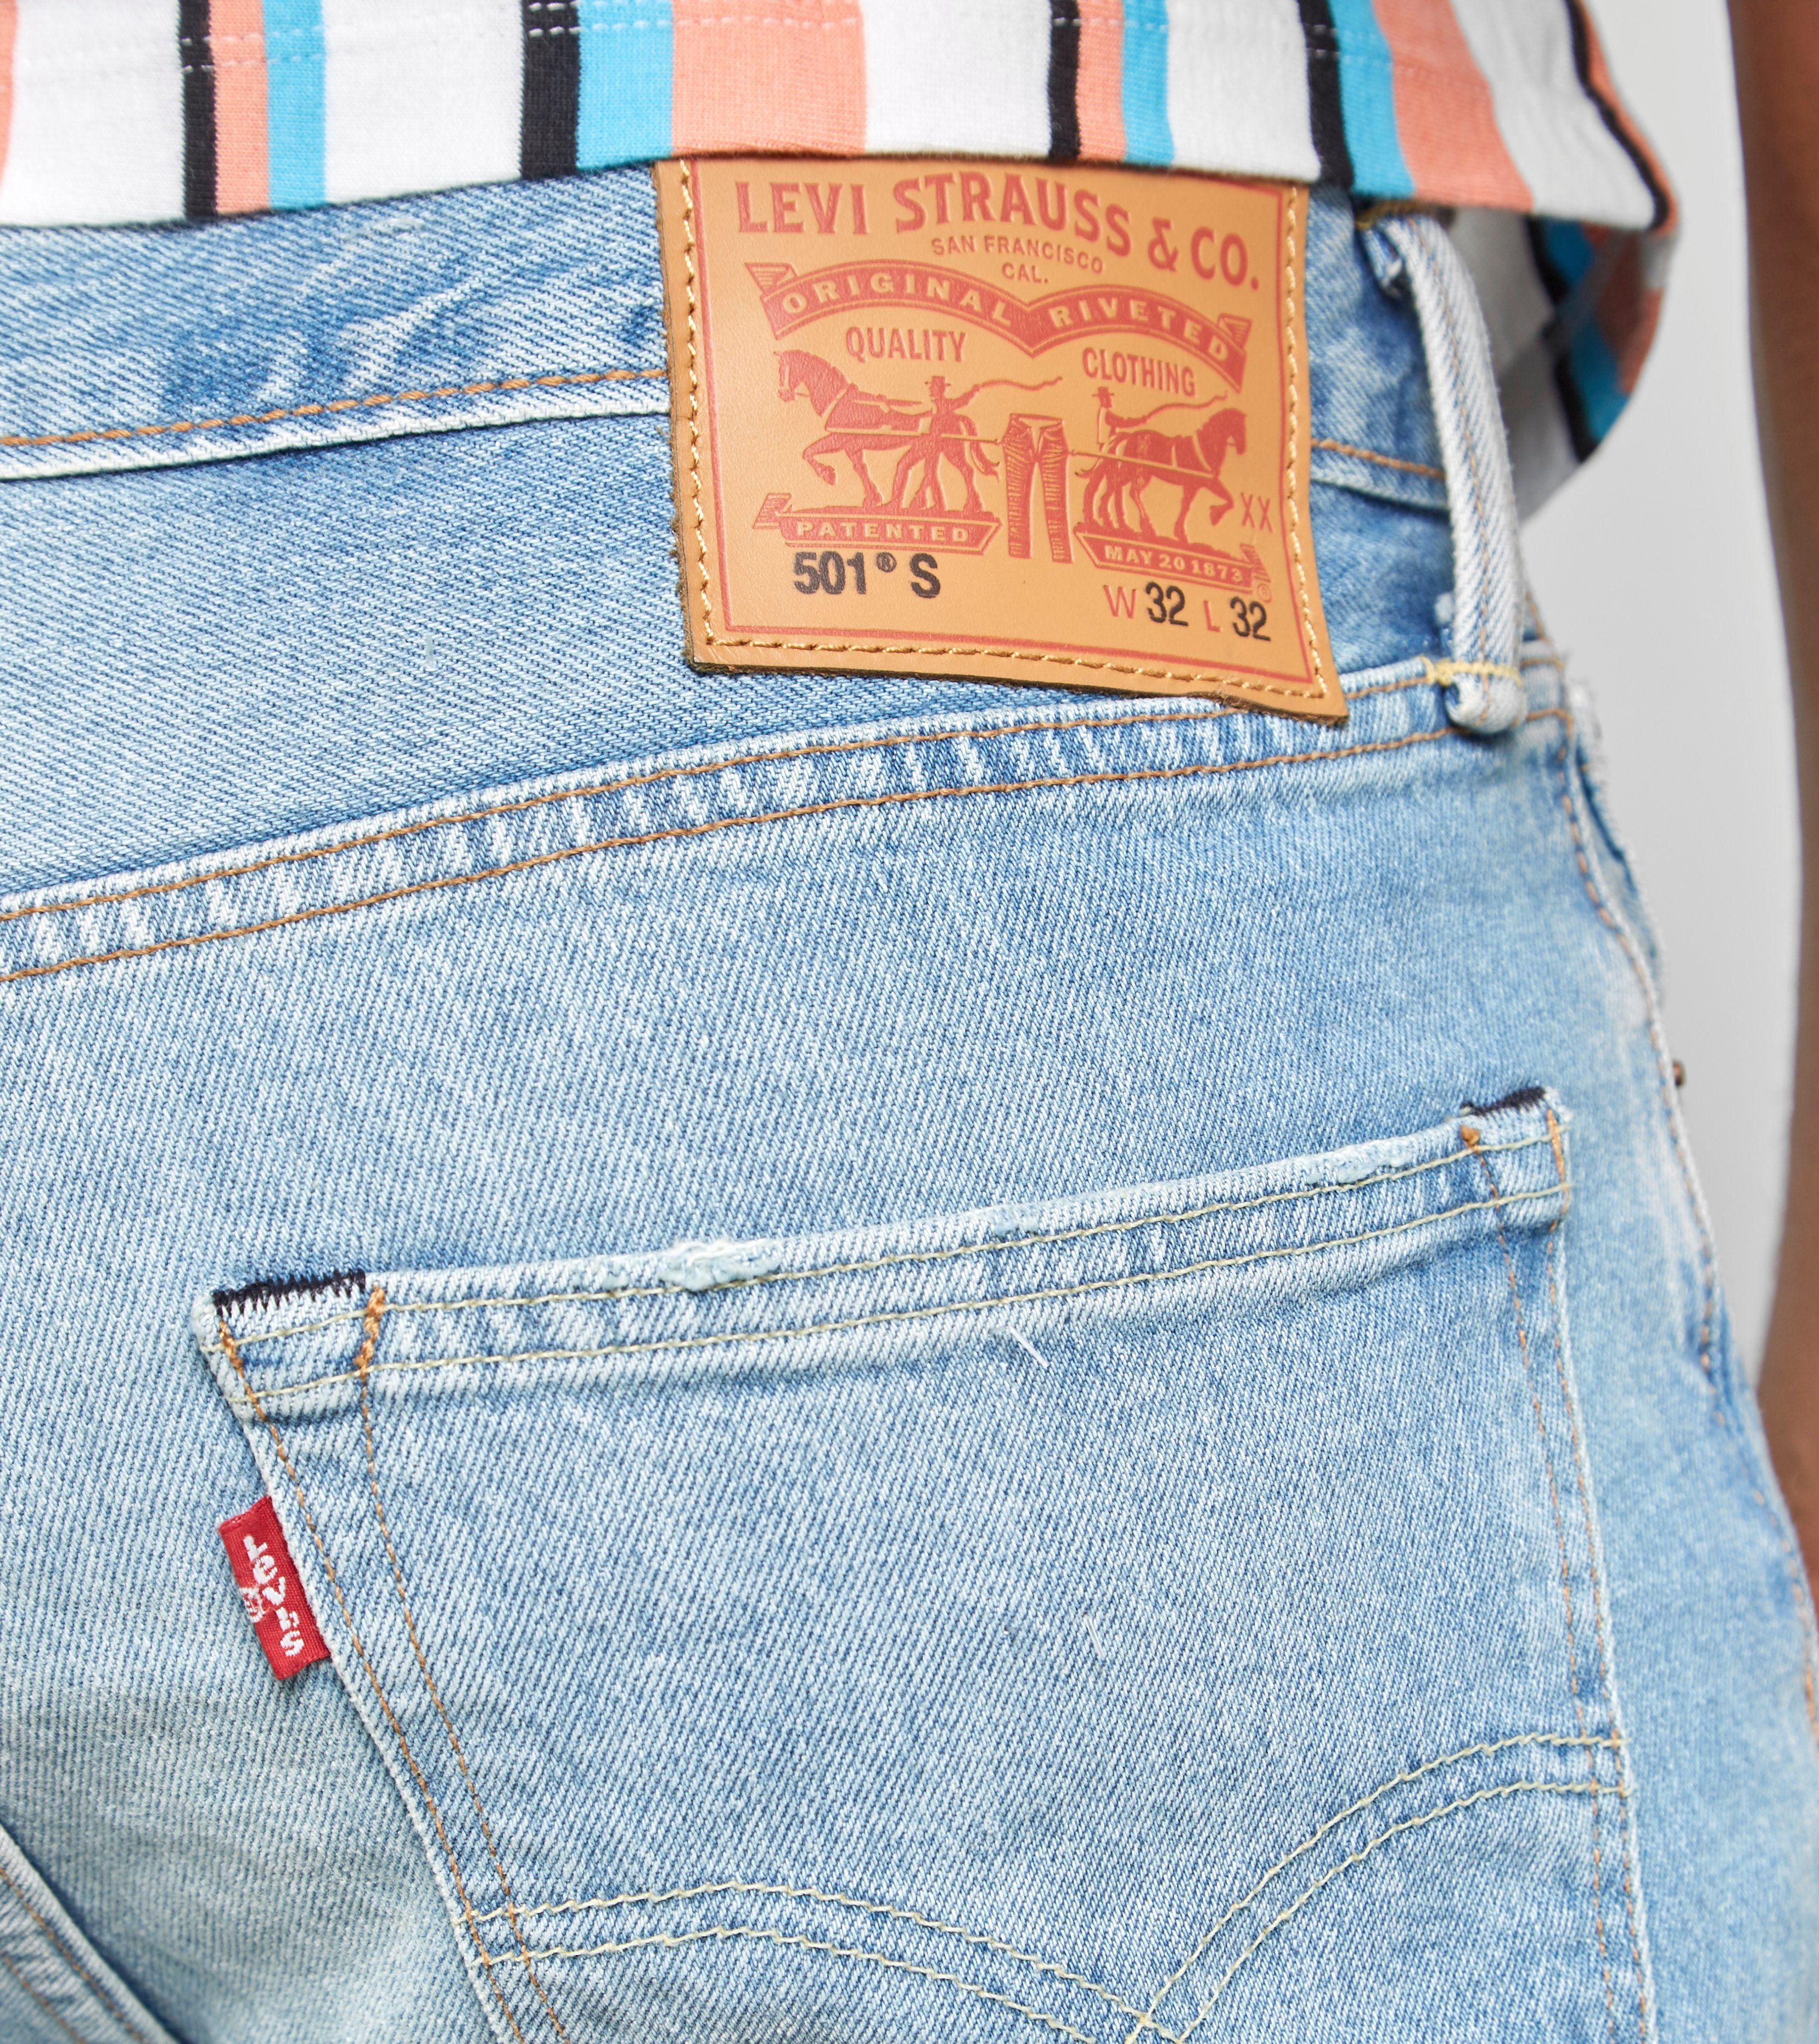 Levis 501 Skinny Jeans